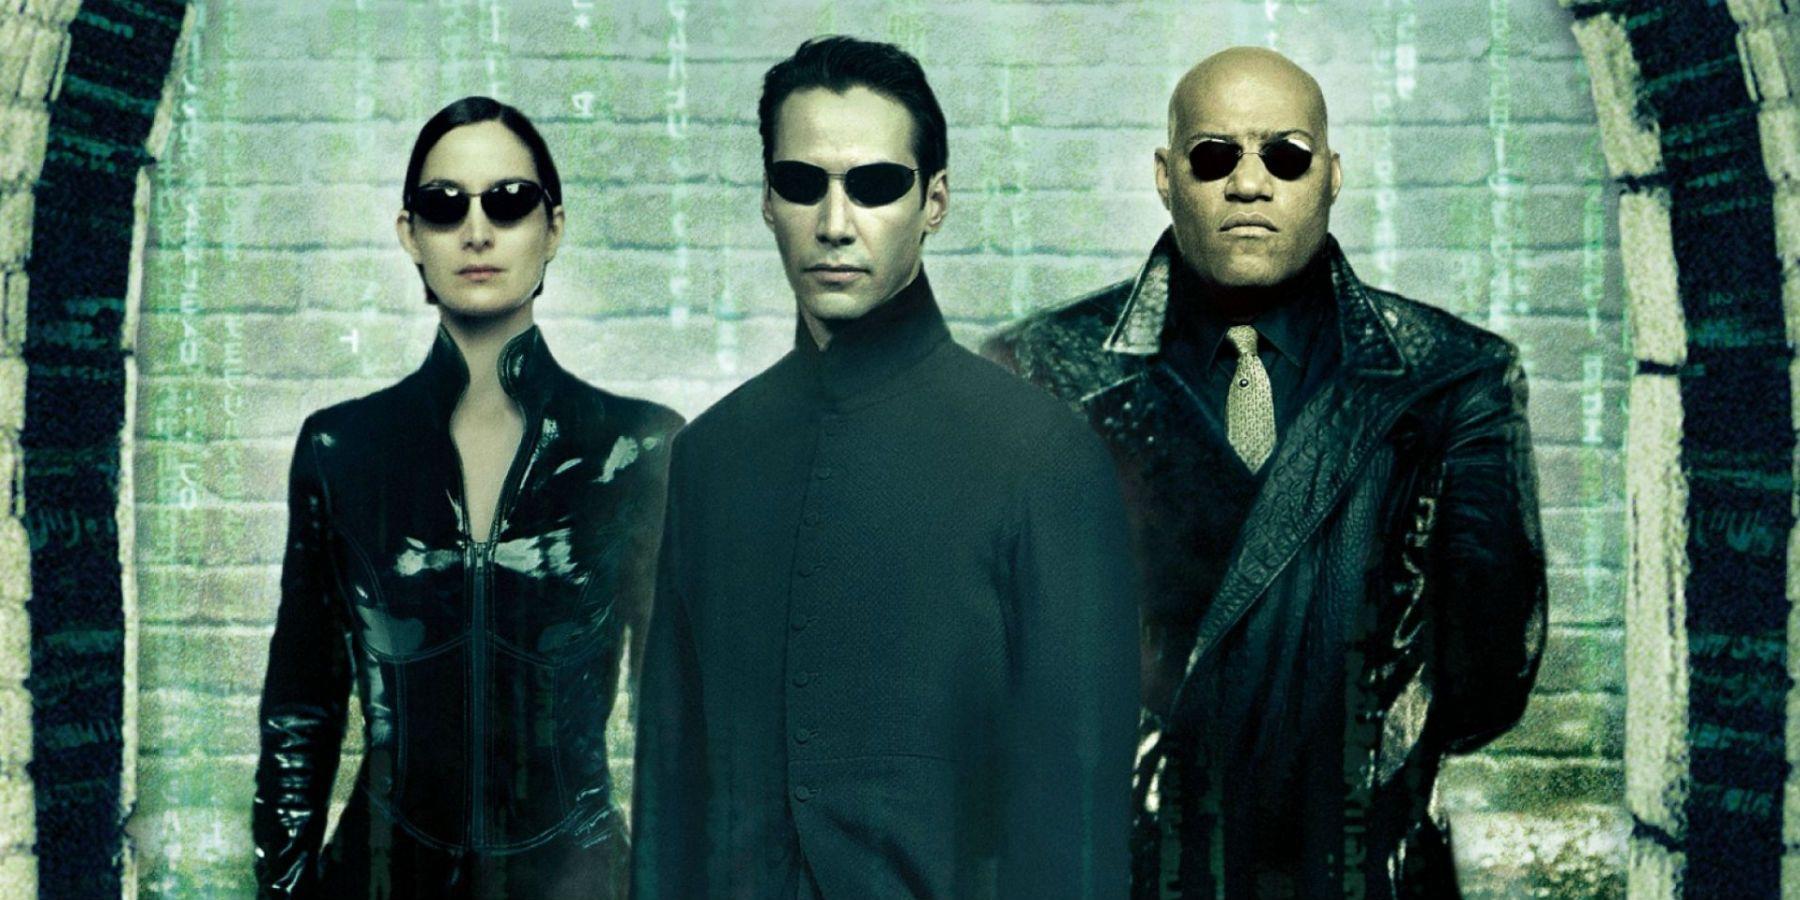 Matrix (Film)